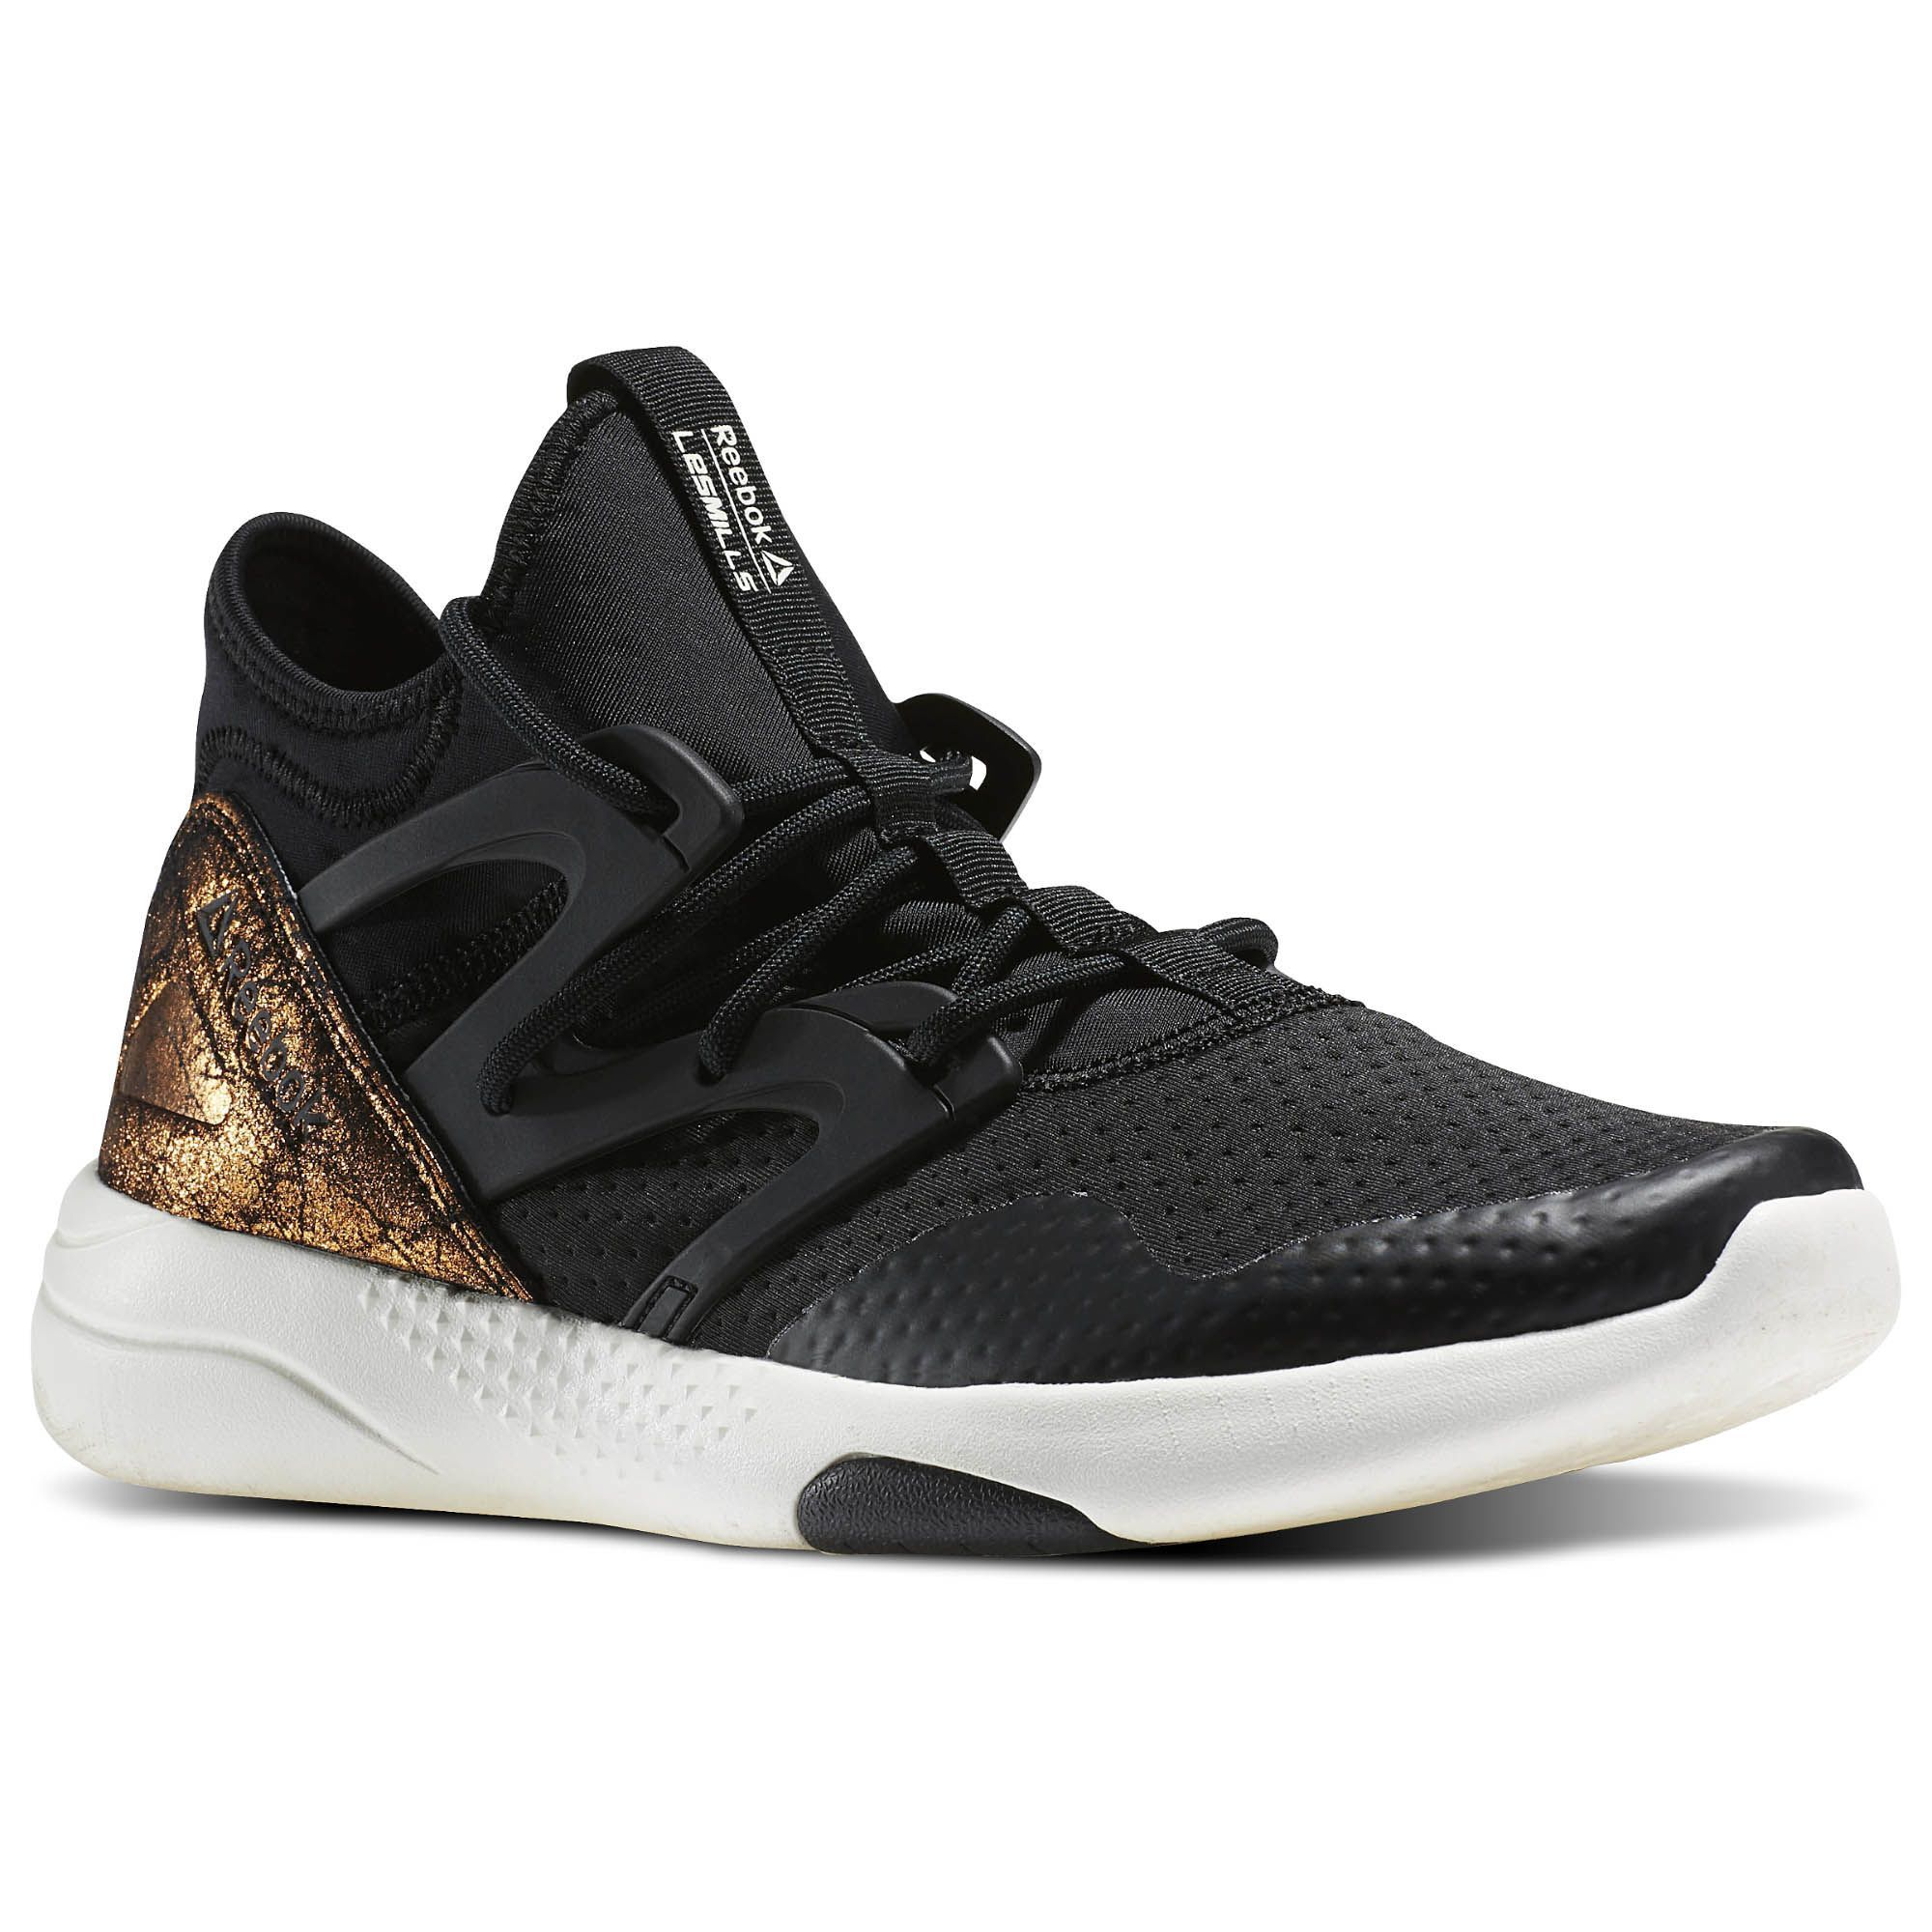 d35330b6fcefd Reebok - LES MILLS Hayasu   Activewear   Pinterest   Reebok, Shoes ...